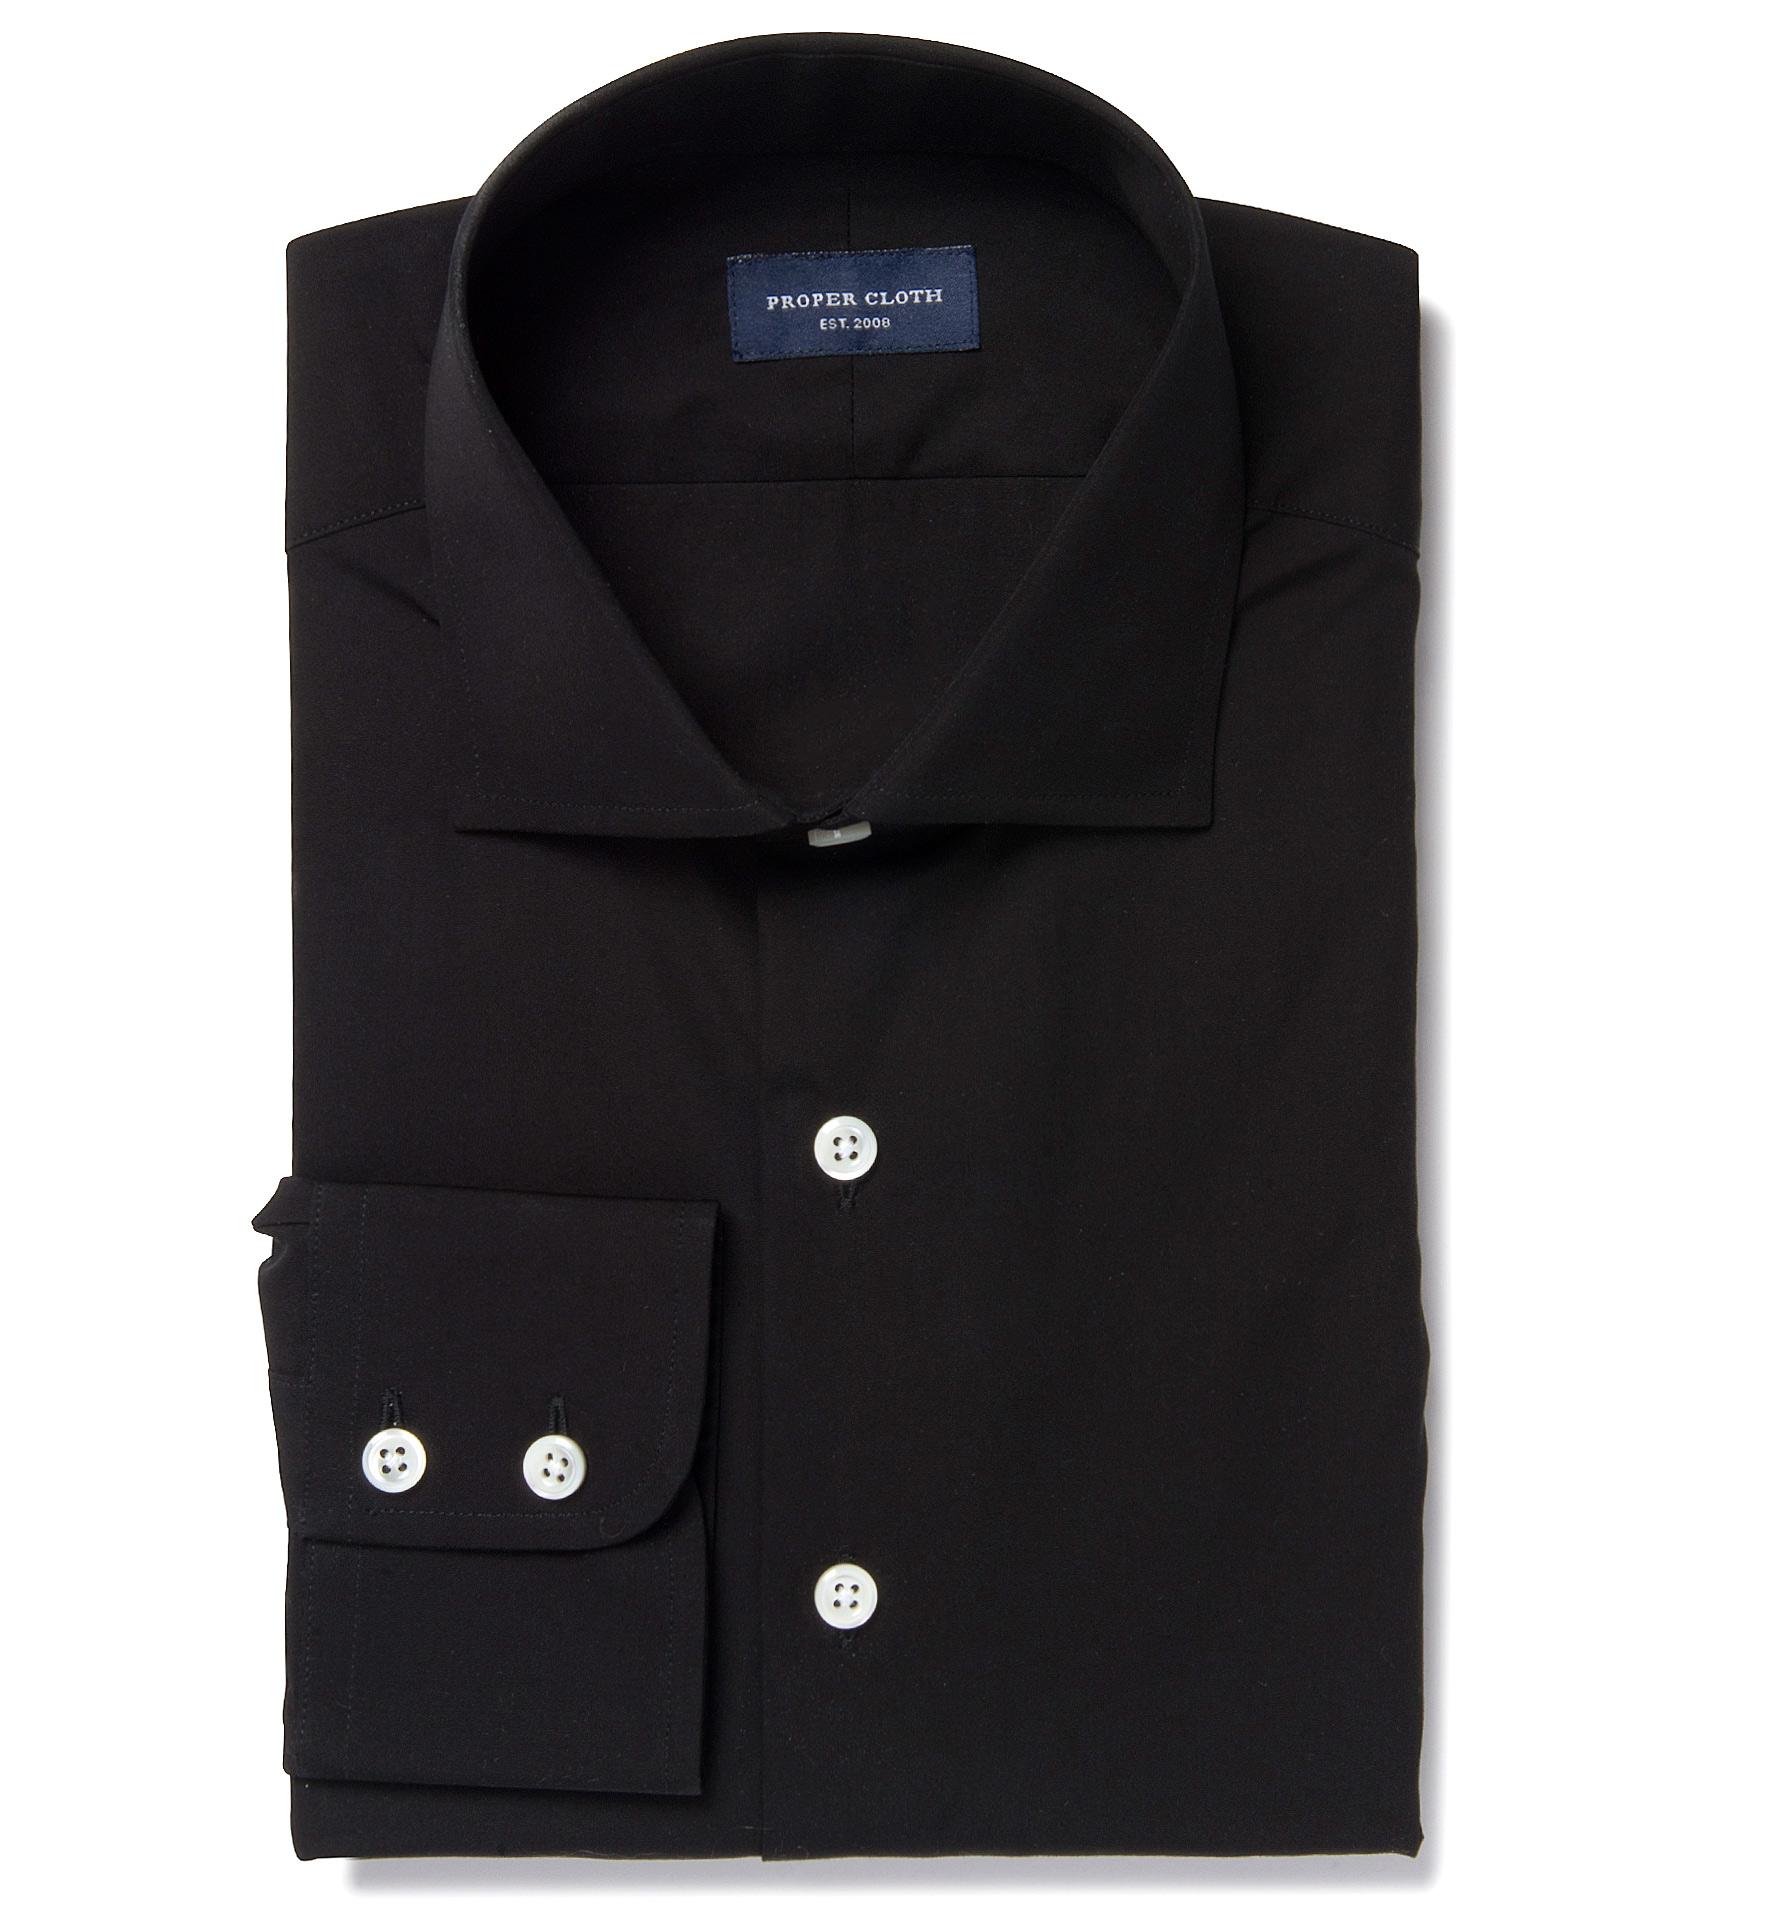 Thomas Mason Black Luxury Broadcloth Dress Shirt By Proper